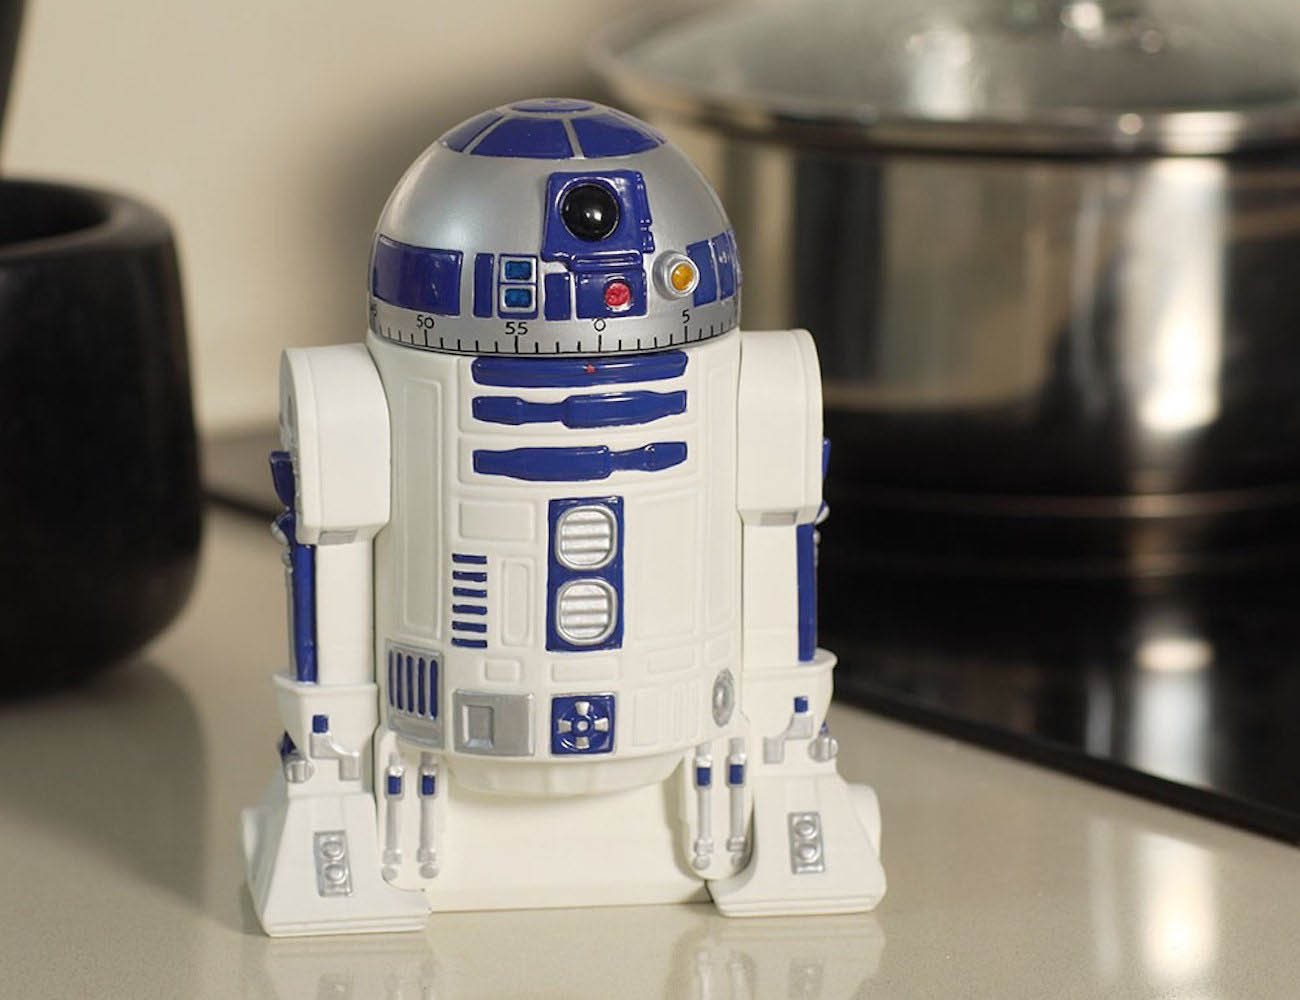 Star Wars R2-D2 Kitchen Timer- ThinkGeek (Apenas Venda Online)